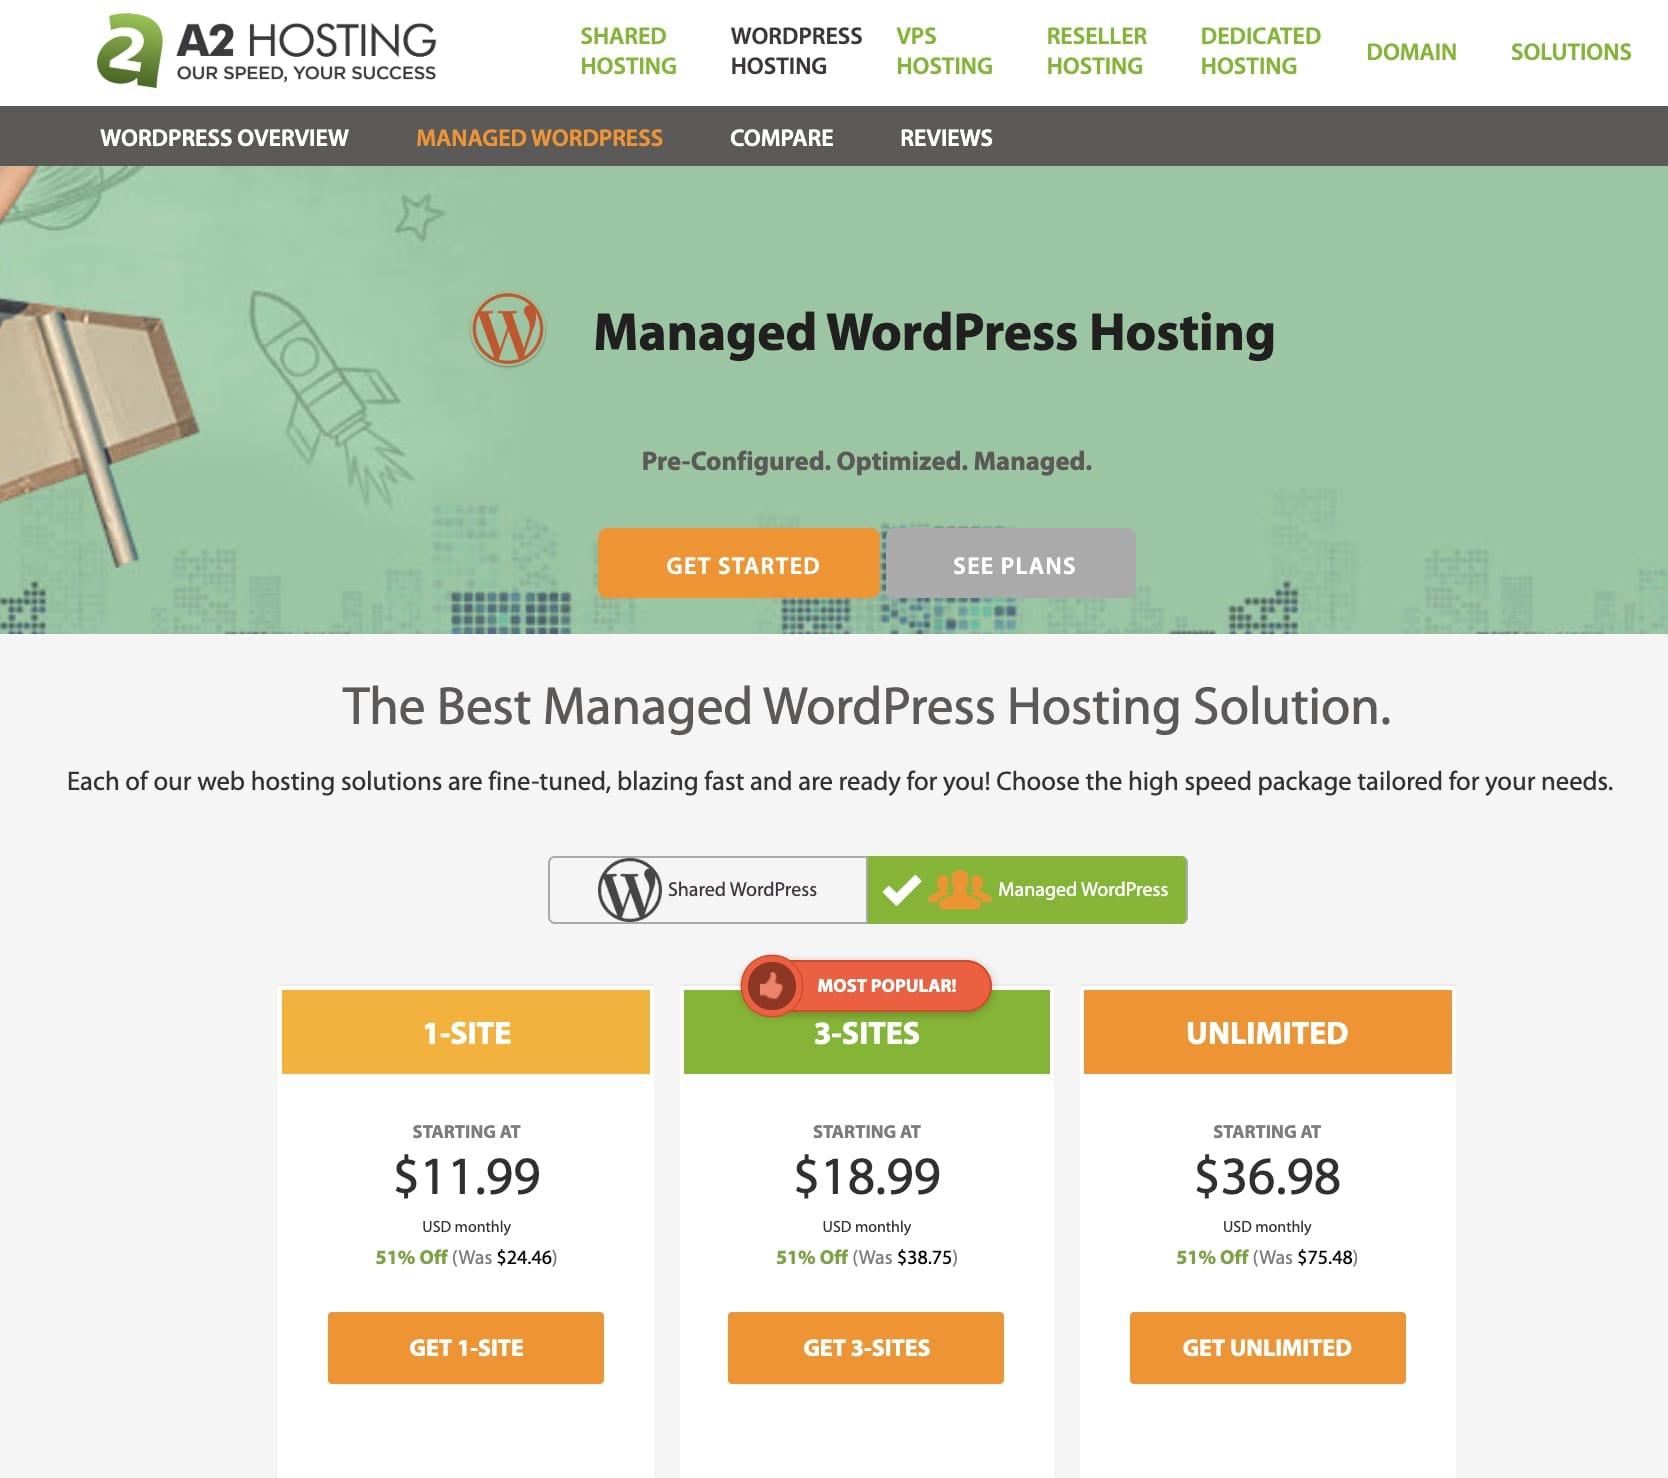 A2 Hosting WP Managed